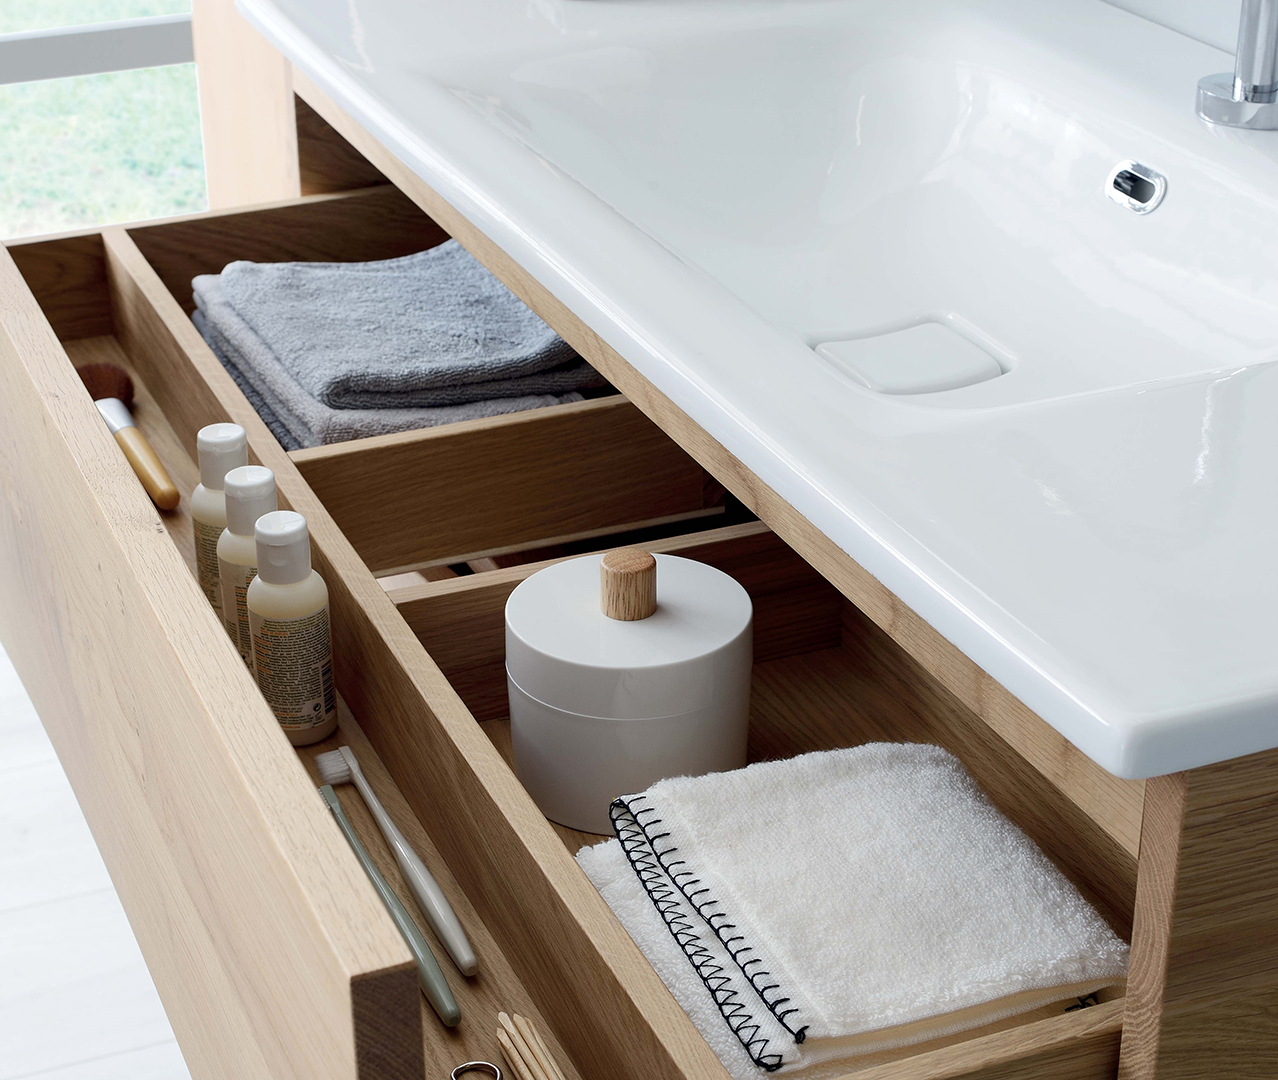 Gamme Sherwood, salle de bain bois, meuble SDB – Sanijura